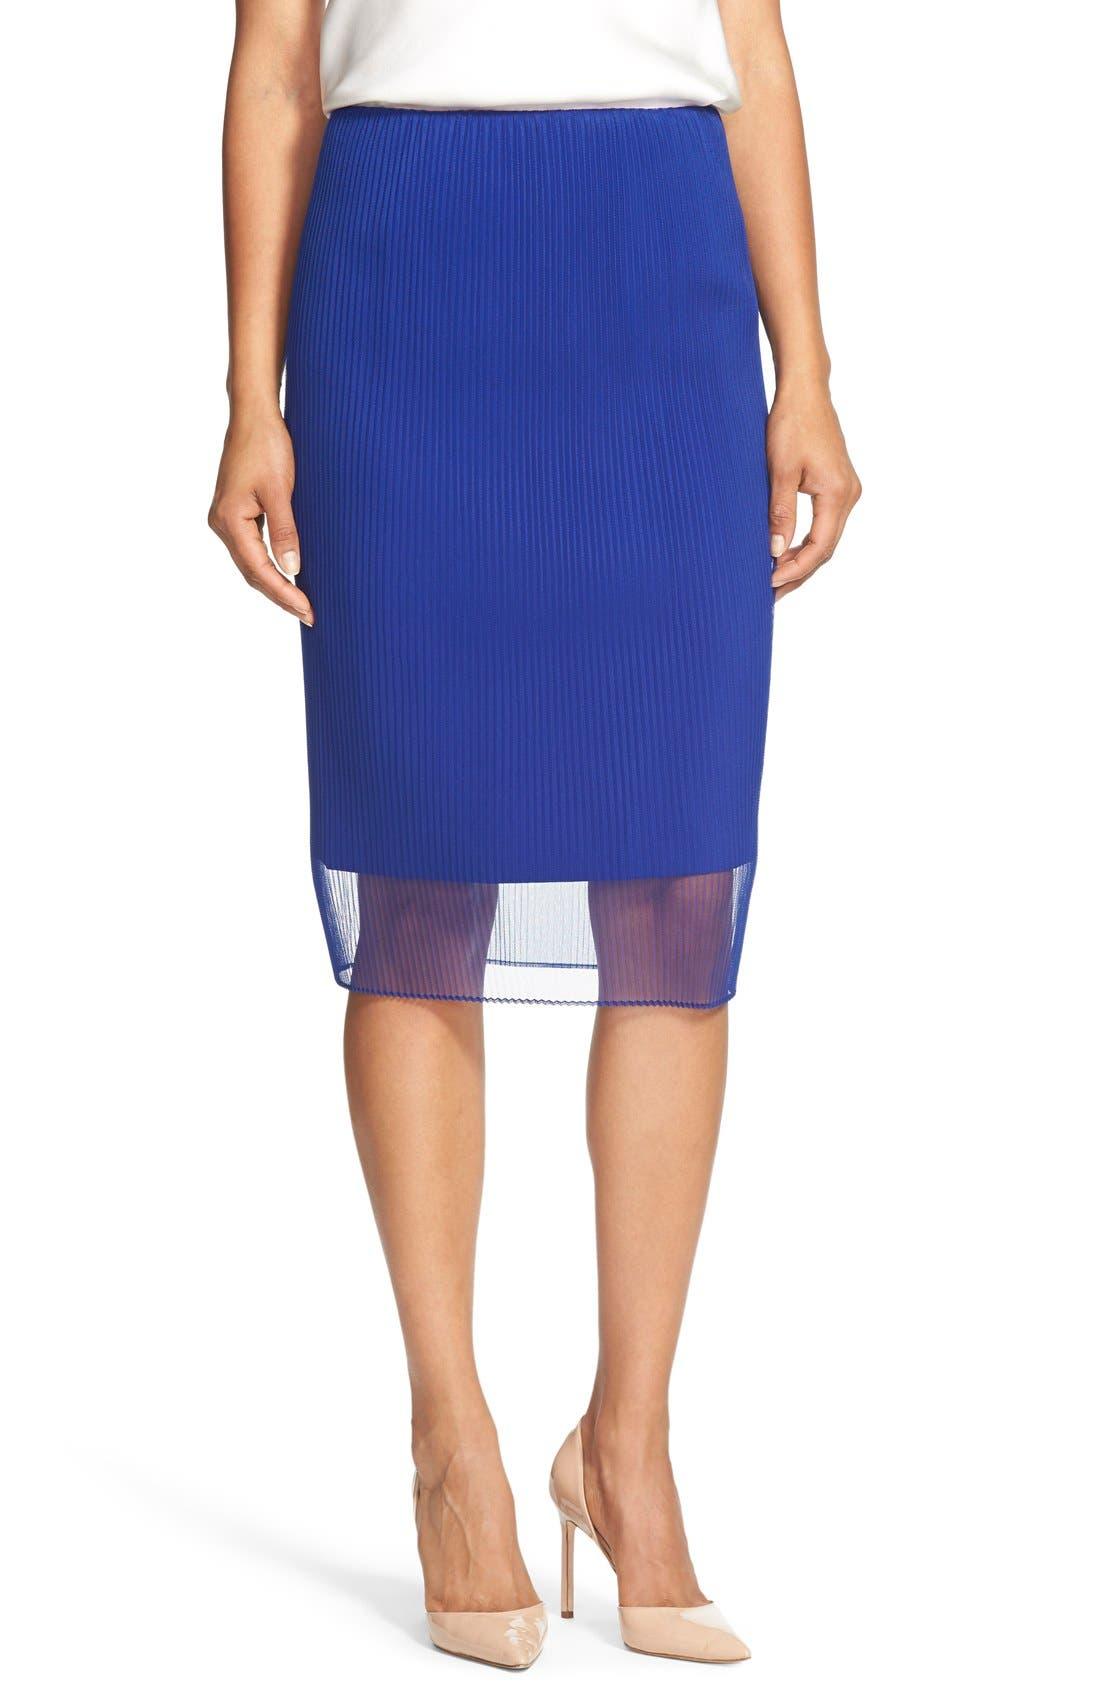 Main Image - BOSS 'Veplyti' Plissé Overlay Pencil Skirt